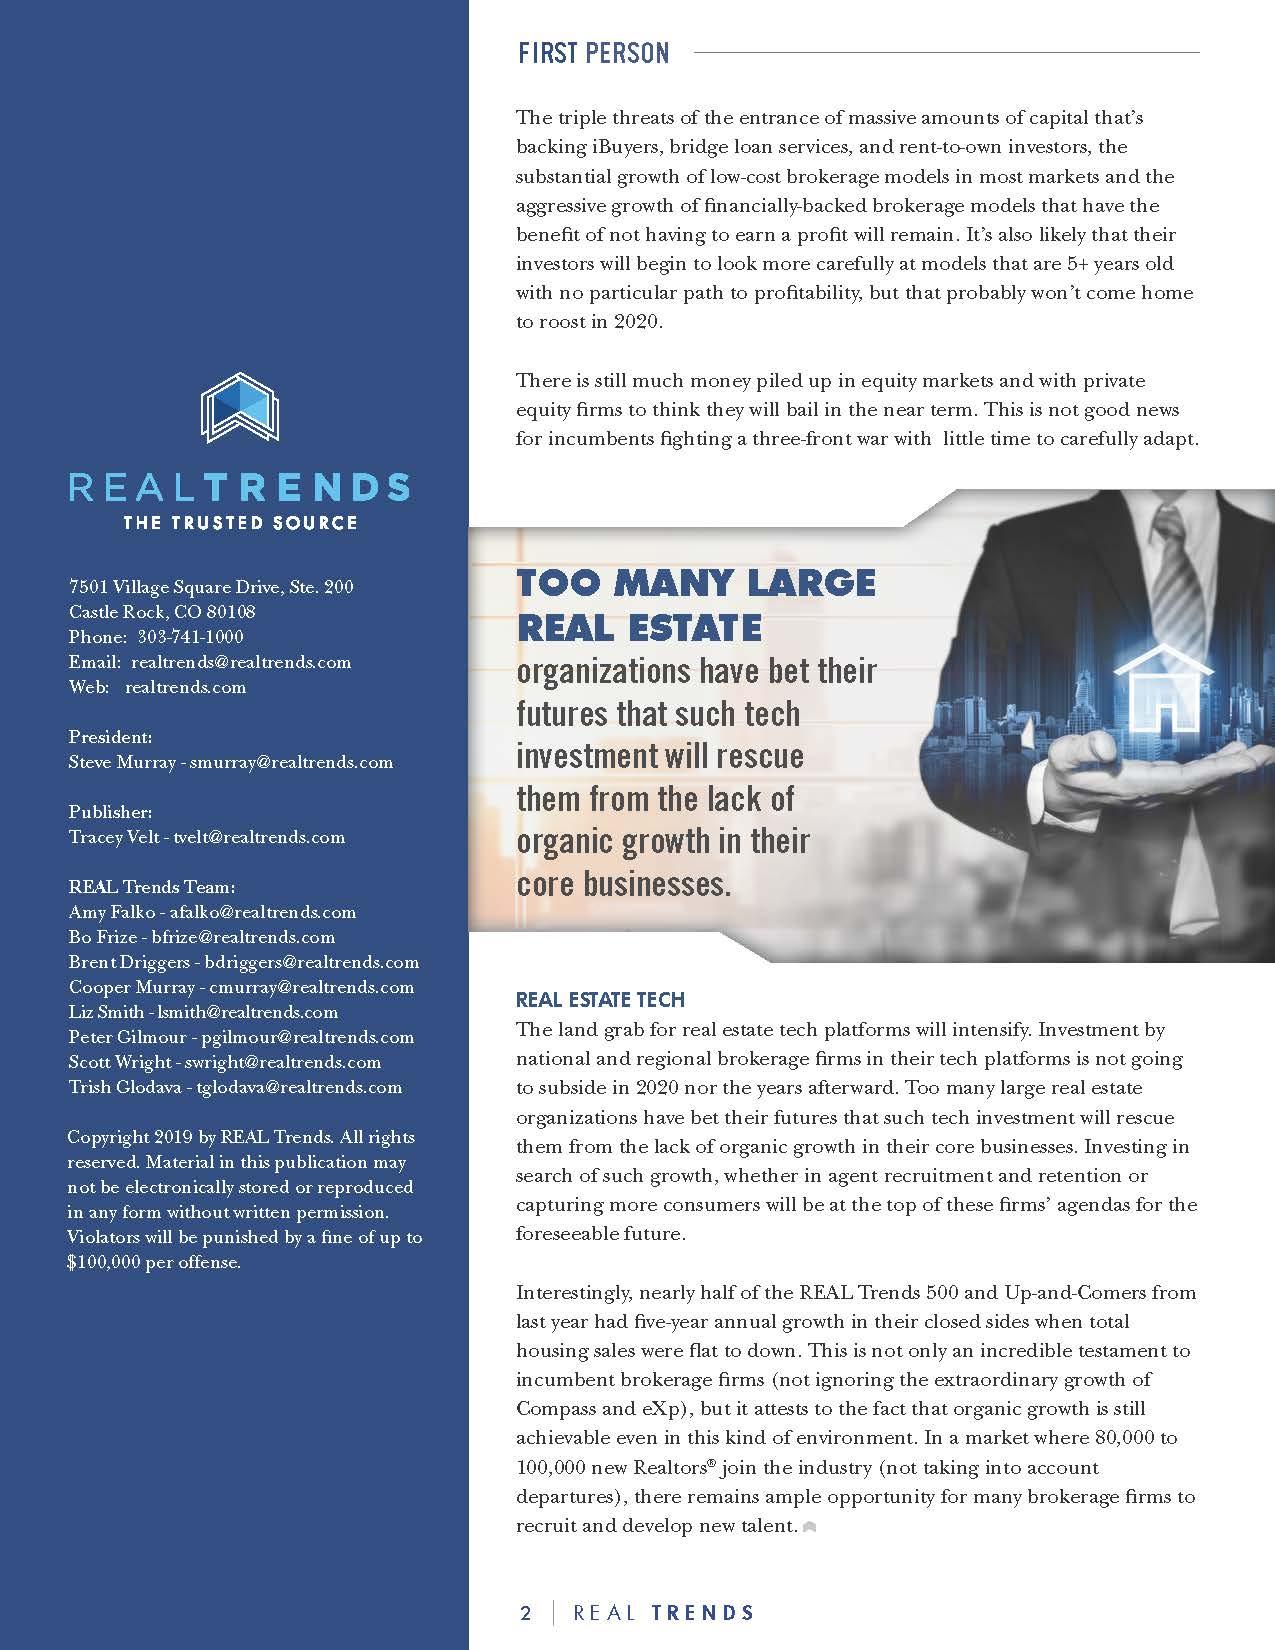 RealTrendsNewsletter_Page_02.jpg